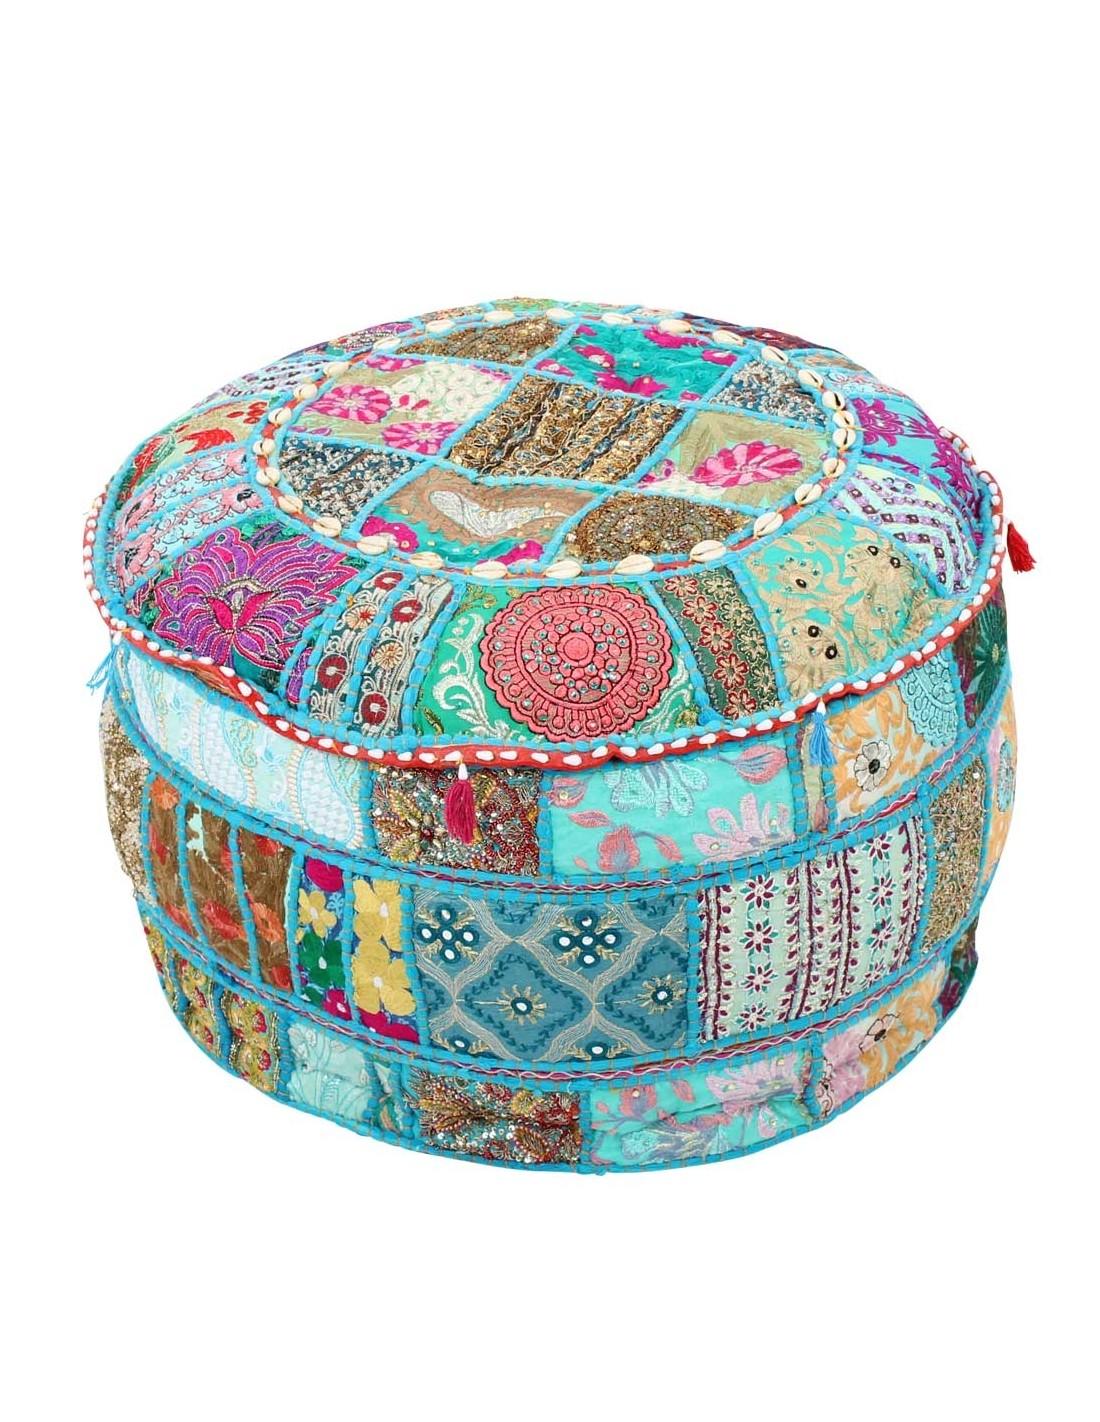 indisches sitzkissen pouf sashi 55cm im albena shop. Black Bedroom Furniture Sets. Home Design Ideas